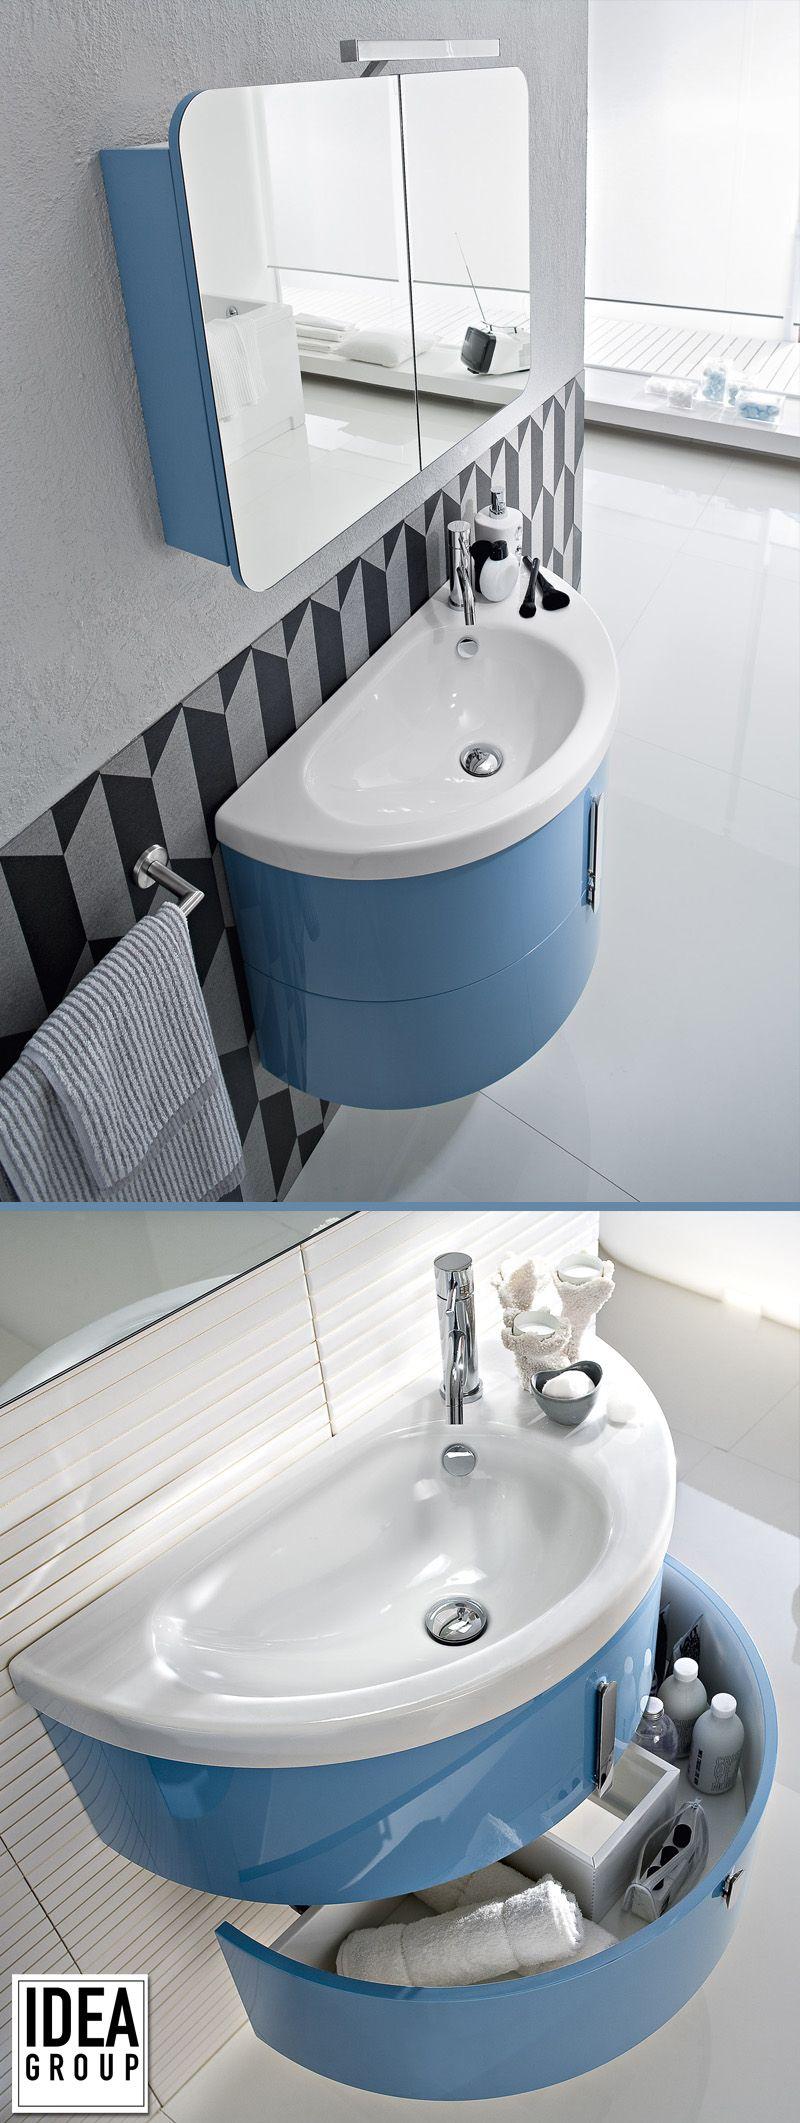 Salle De Bain Idea Group ~ salle de bain moon forme demi lune coloris mobilier bleu idea